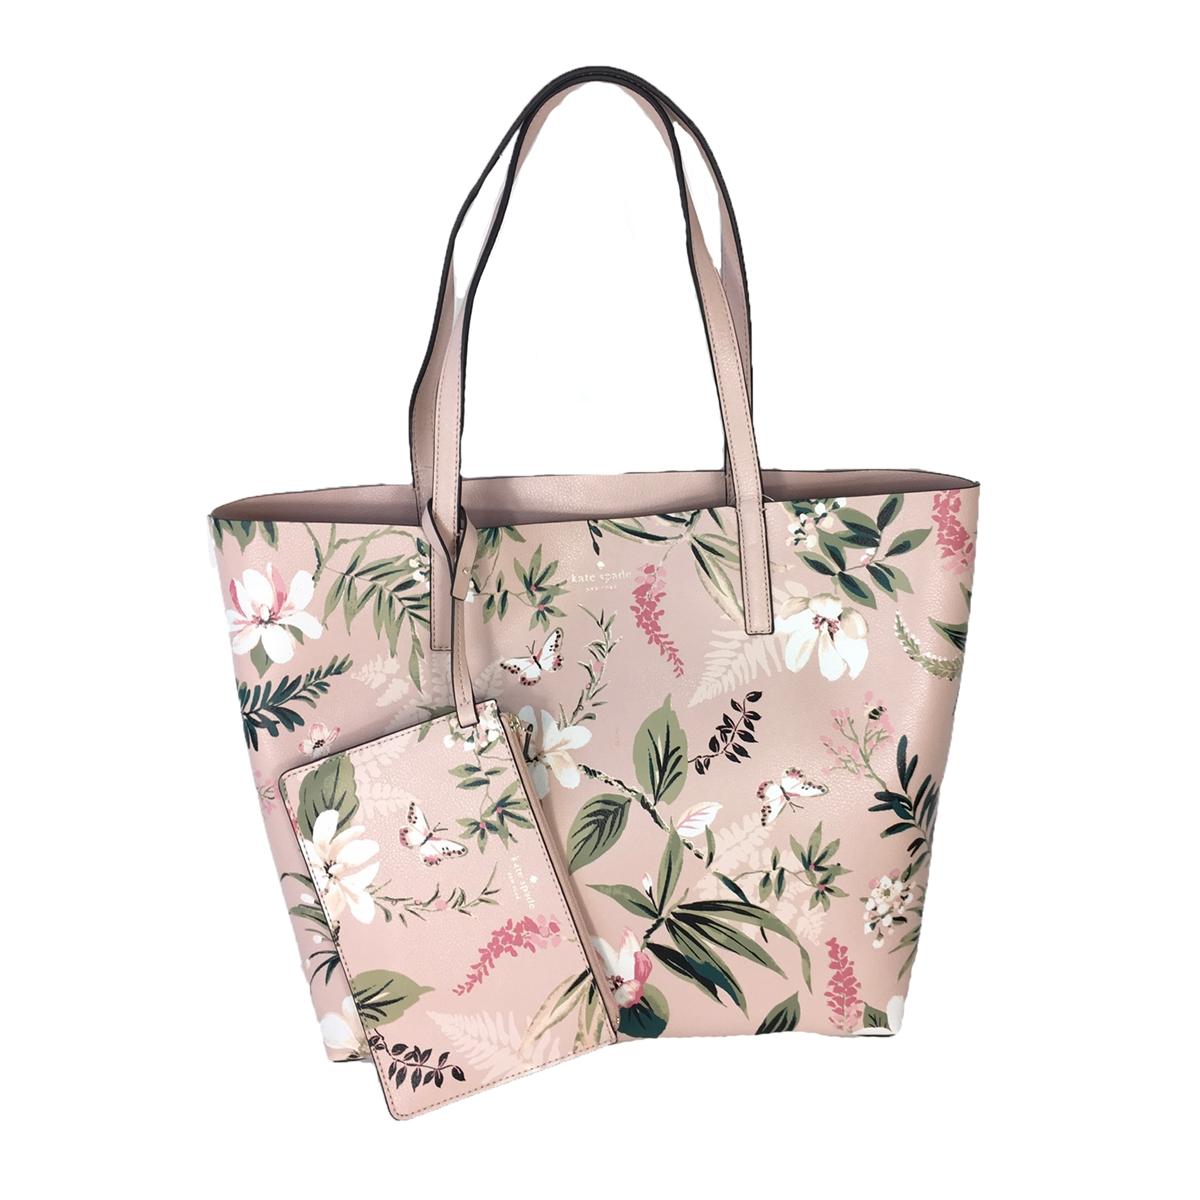 Kate Spade Mya Botanical Floral Print Reversible Tote Bag